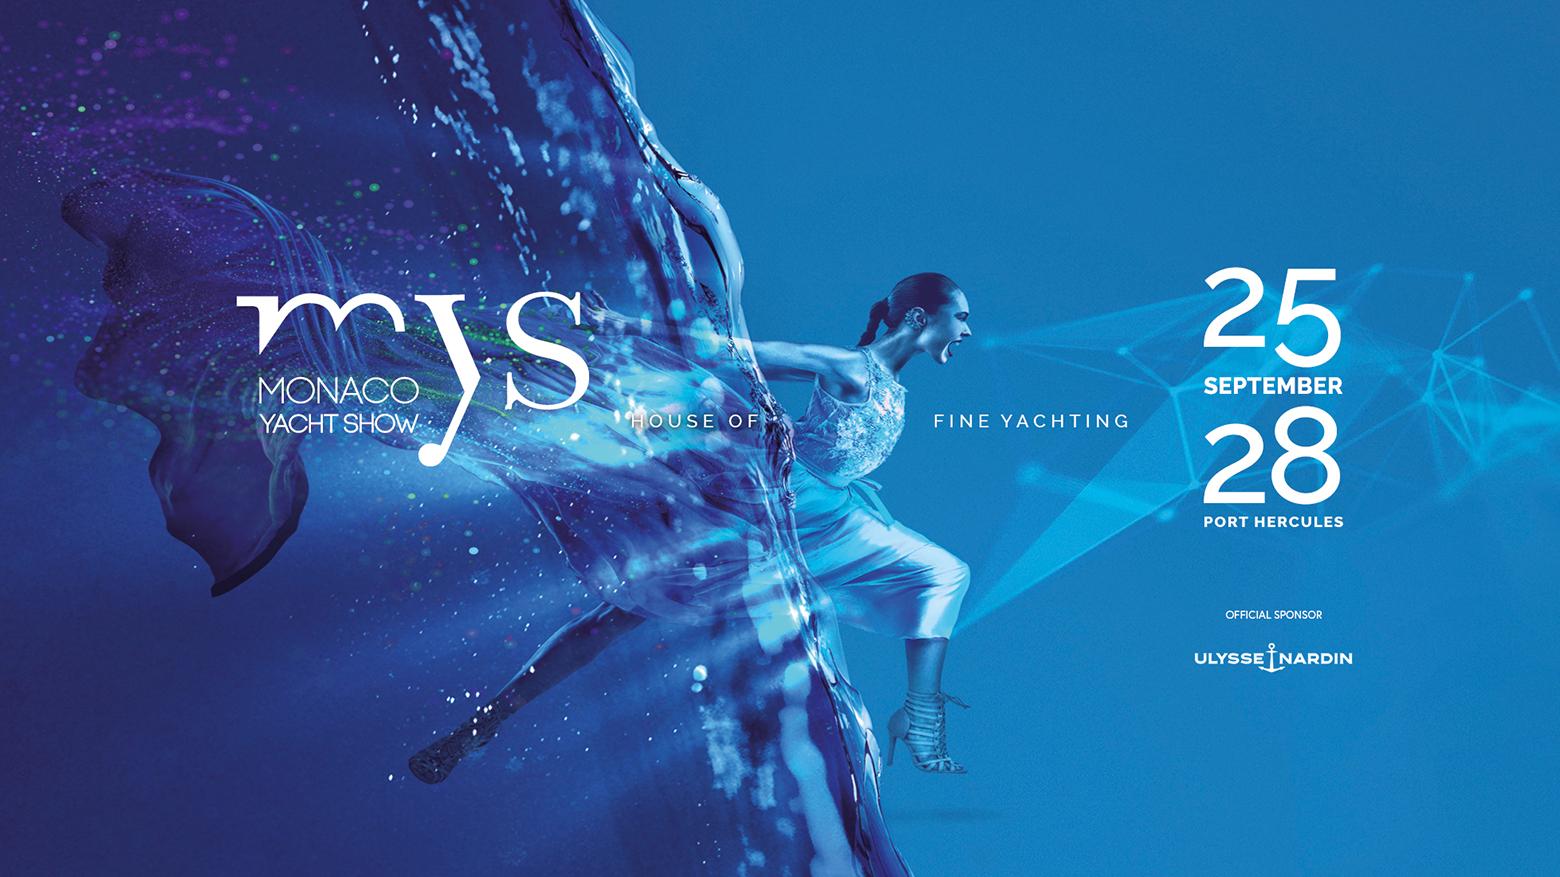 Monaco Yacht Show Preview